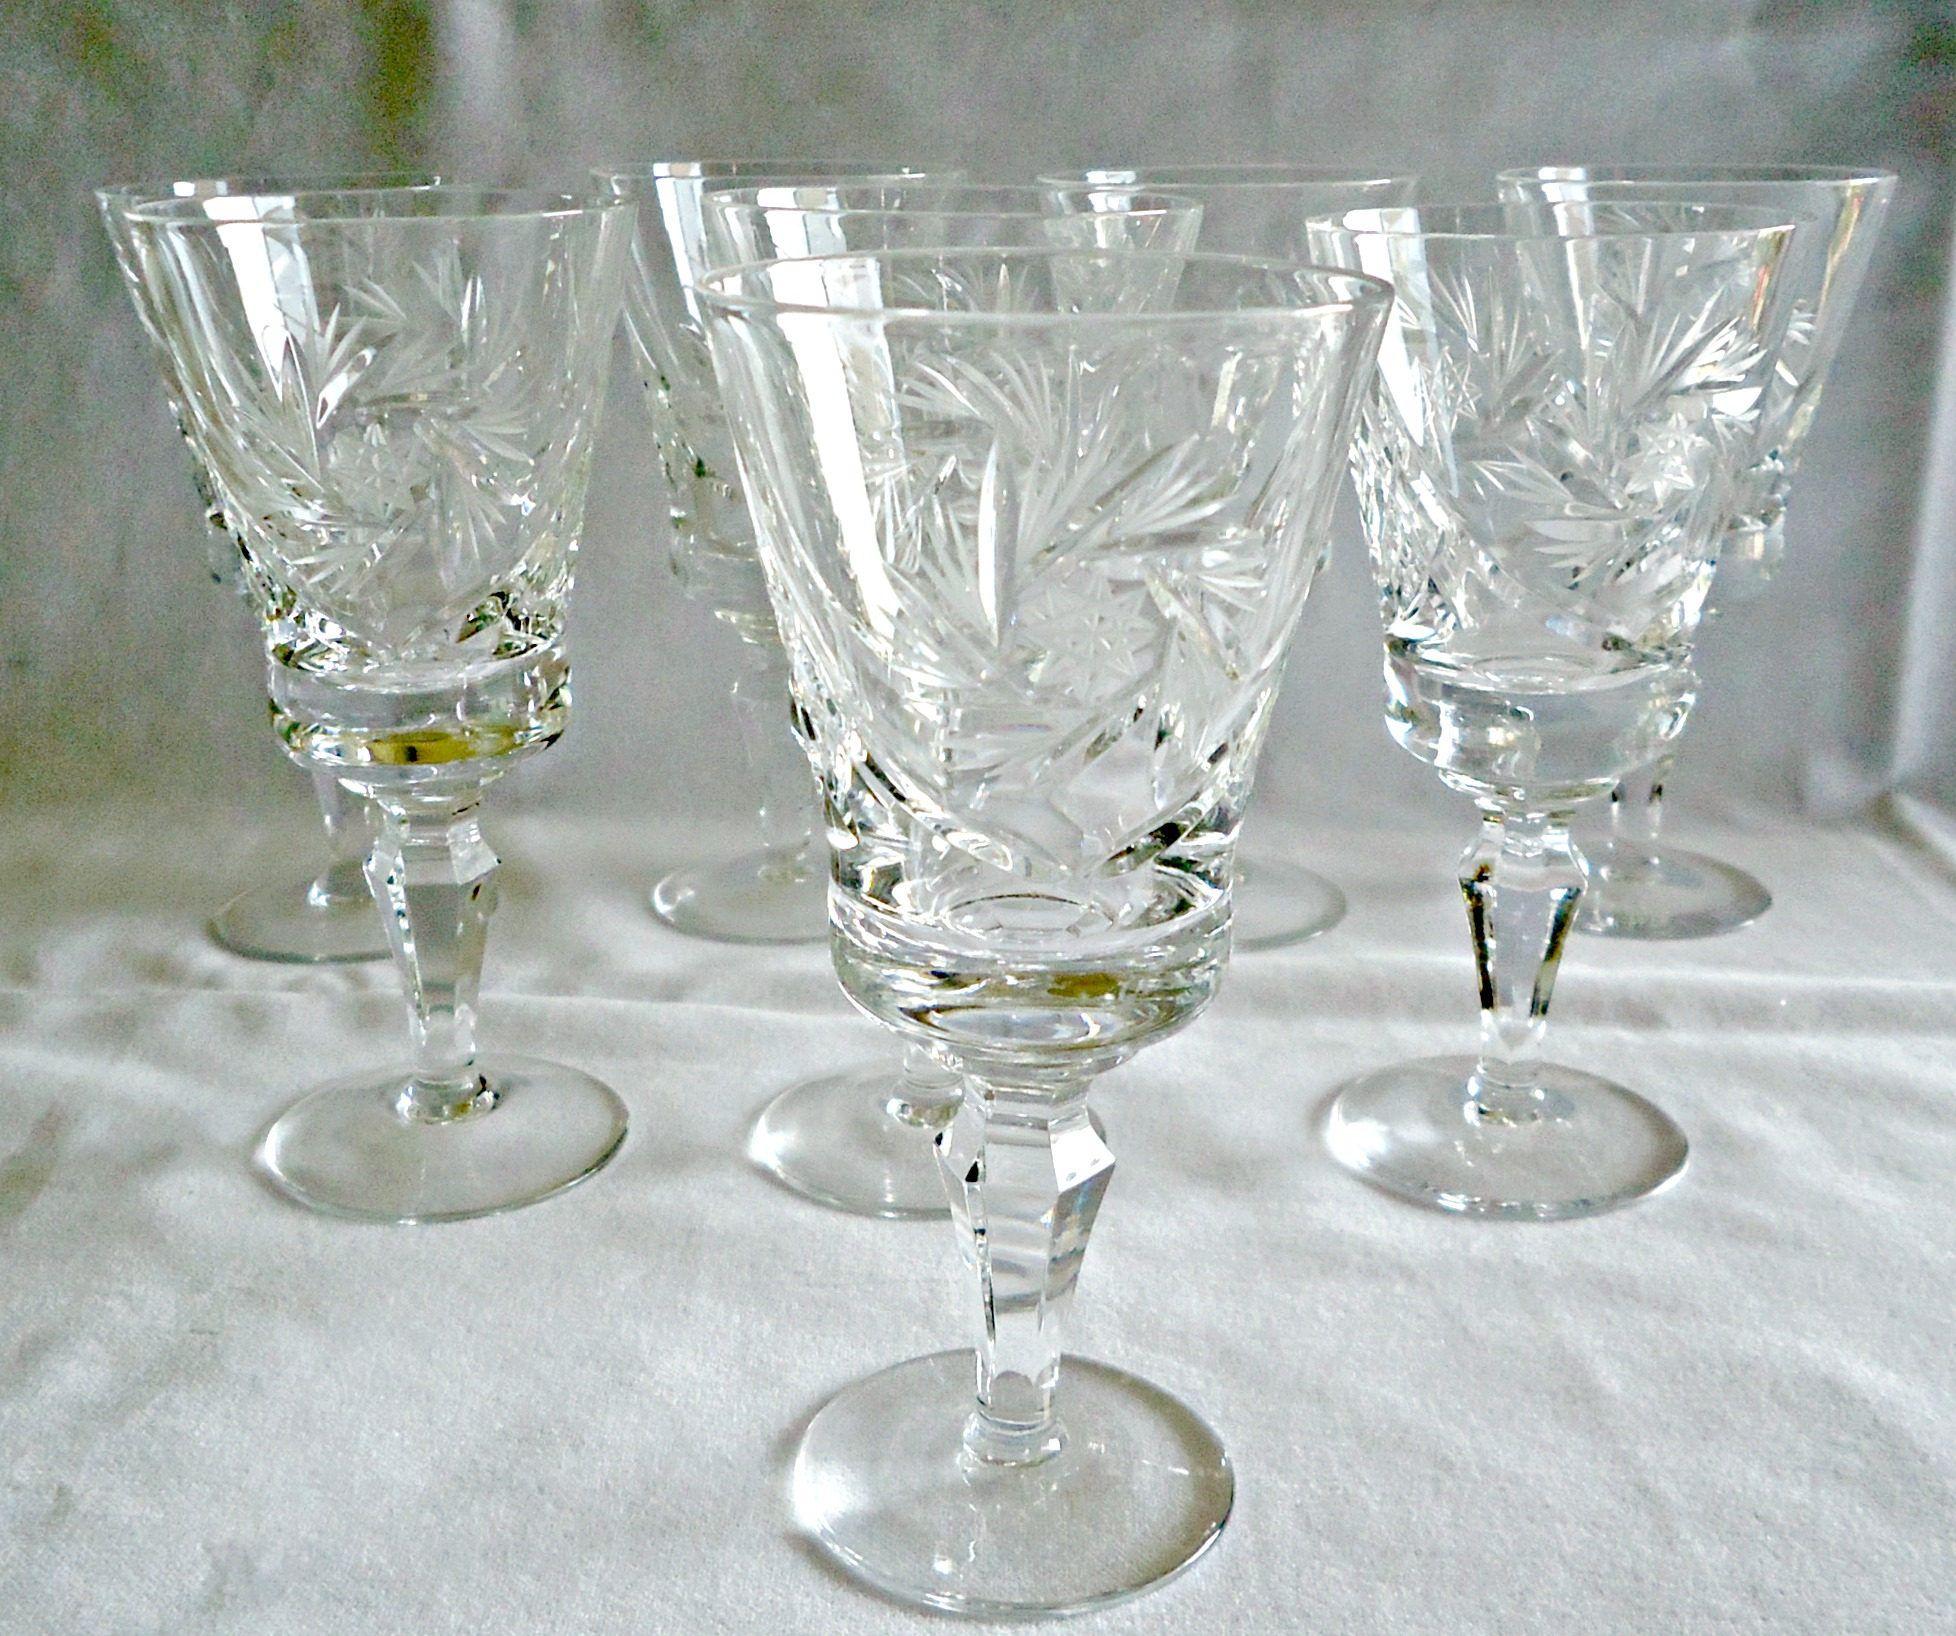 8 Pinwheel Crystal Wine Glasses Stems Goblets Vintage Crystal Wine Glasses Wine Glasses Pinwheels